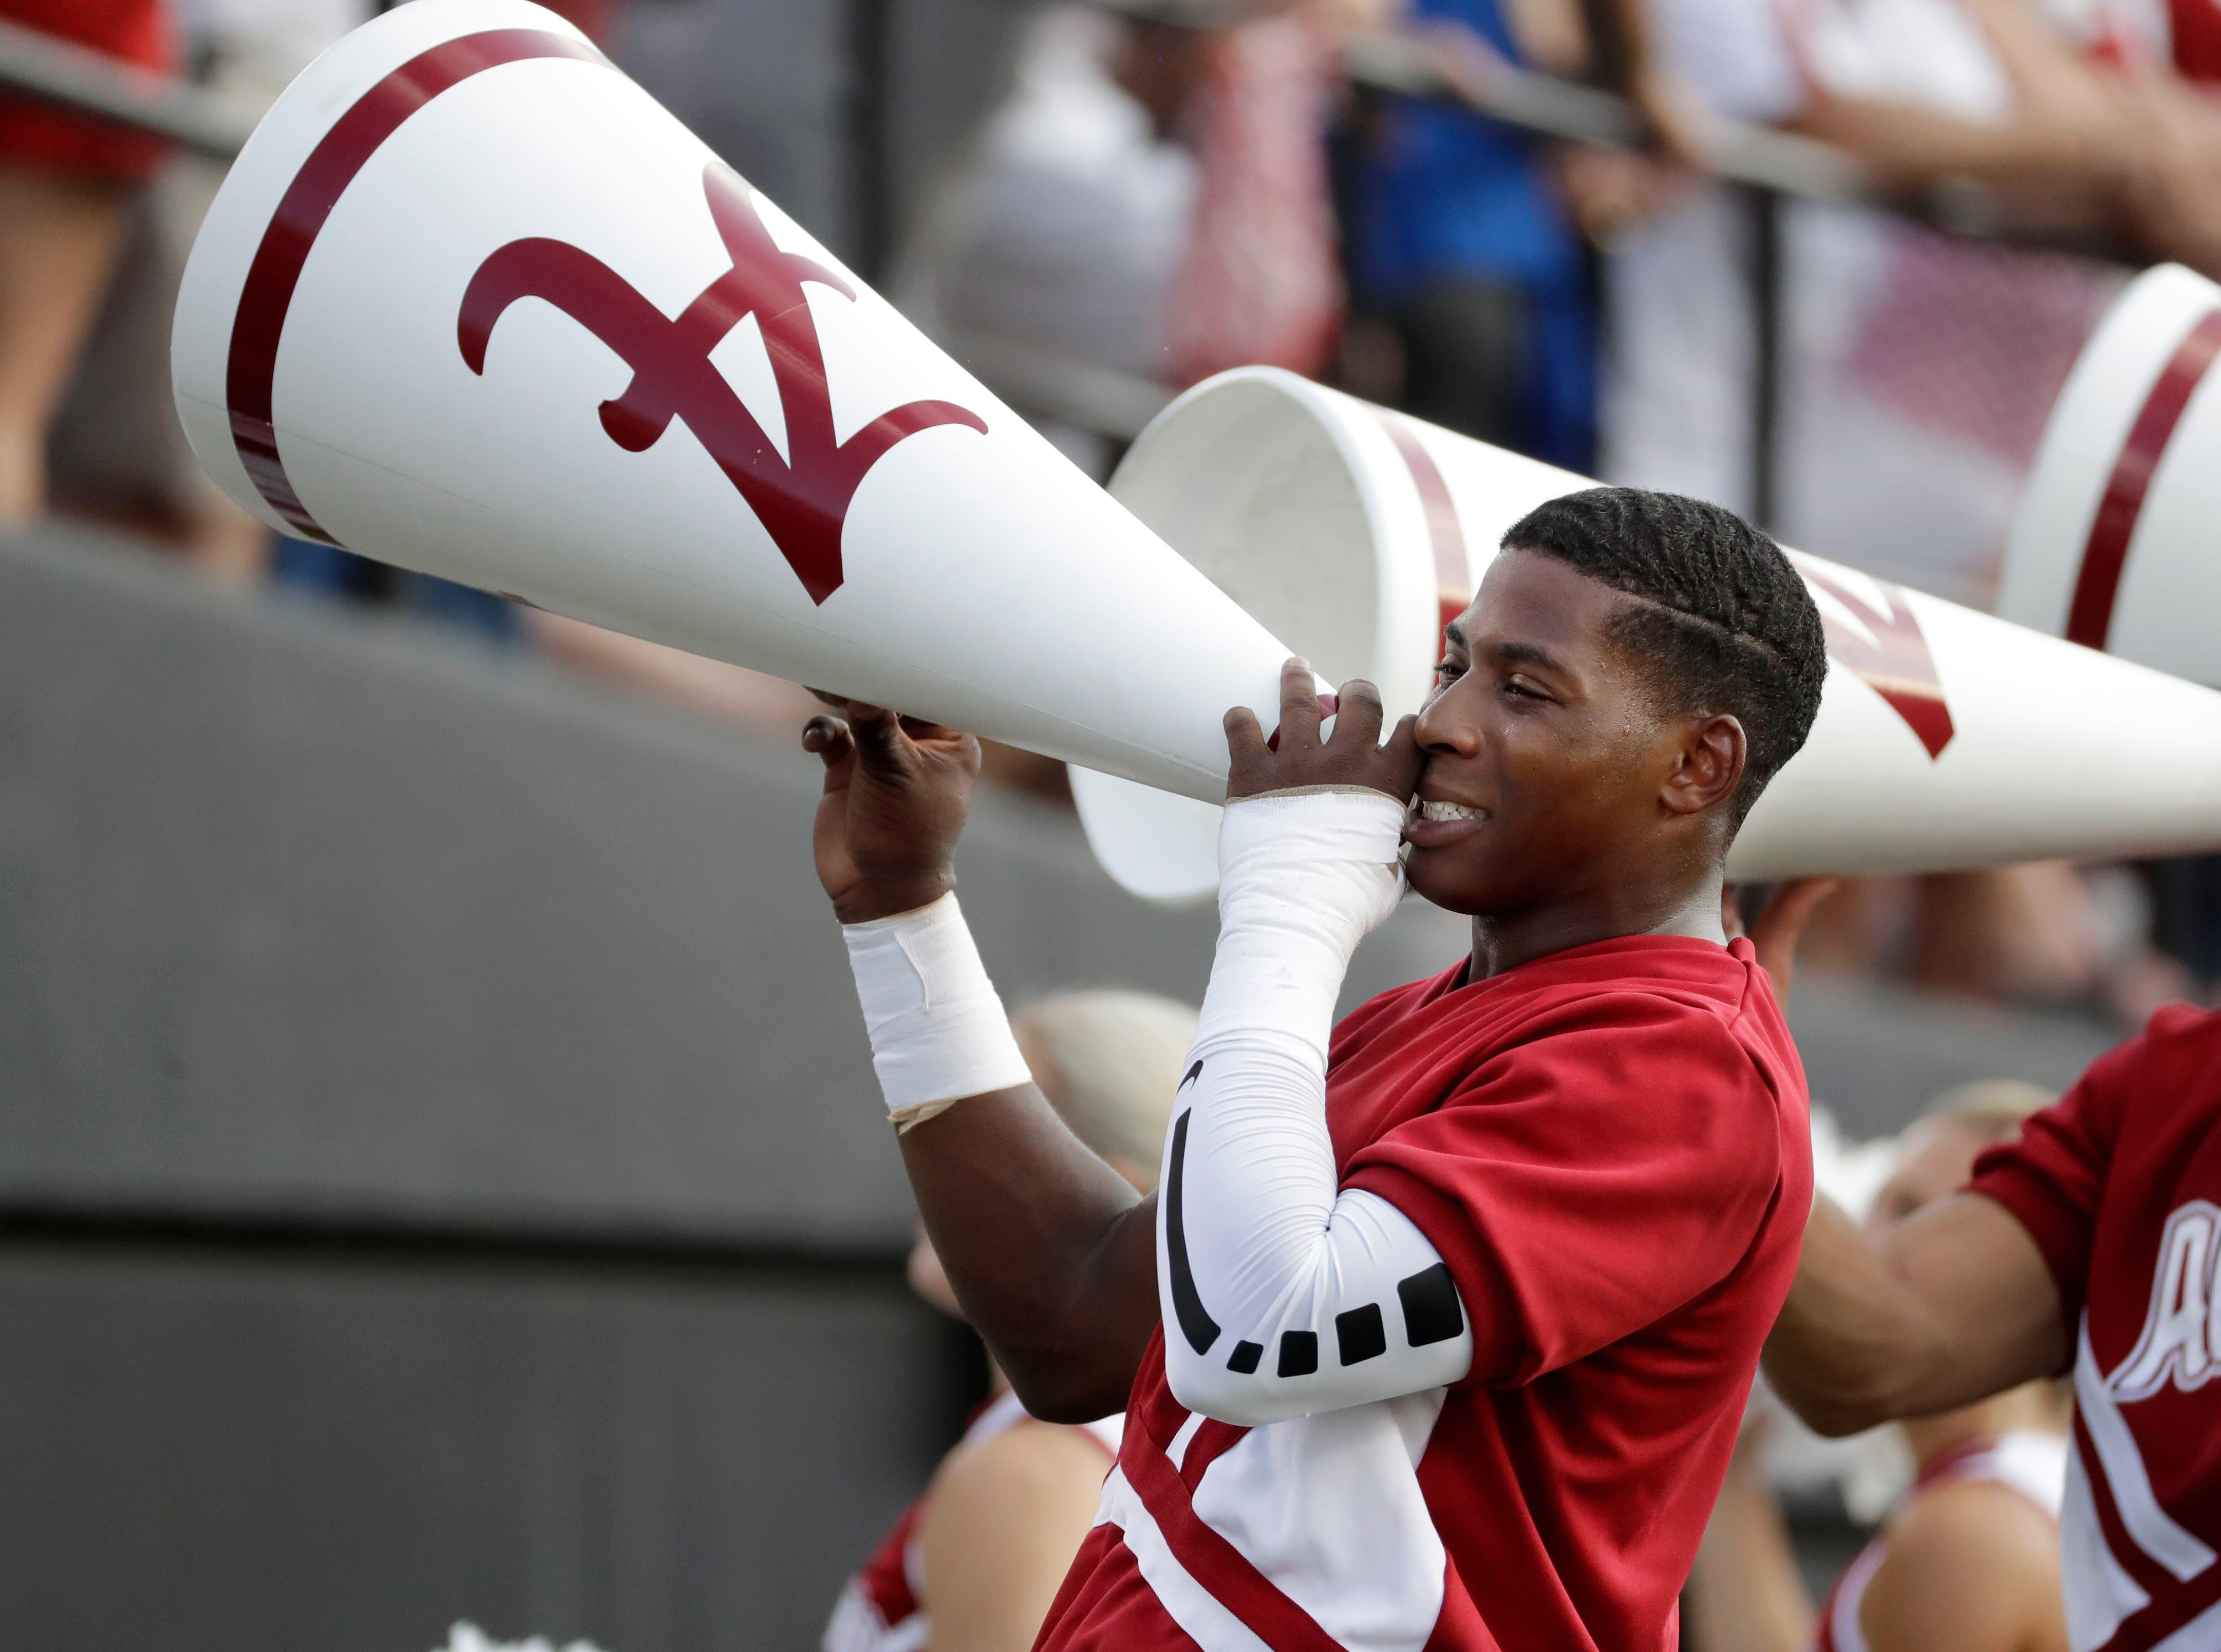 Alabama cheerleaders yell in the second half of an NCAA college football game between Alabama and Vanderbilt Saturday, Sept. 23, 2017, in Nashville, Tenn. (AP Photo/Mark Humphrey)